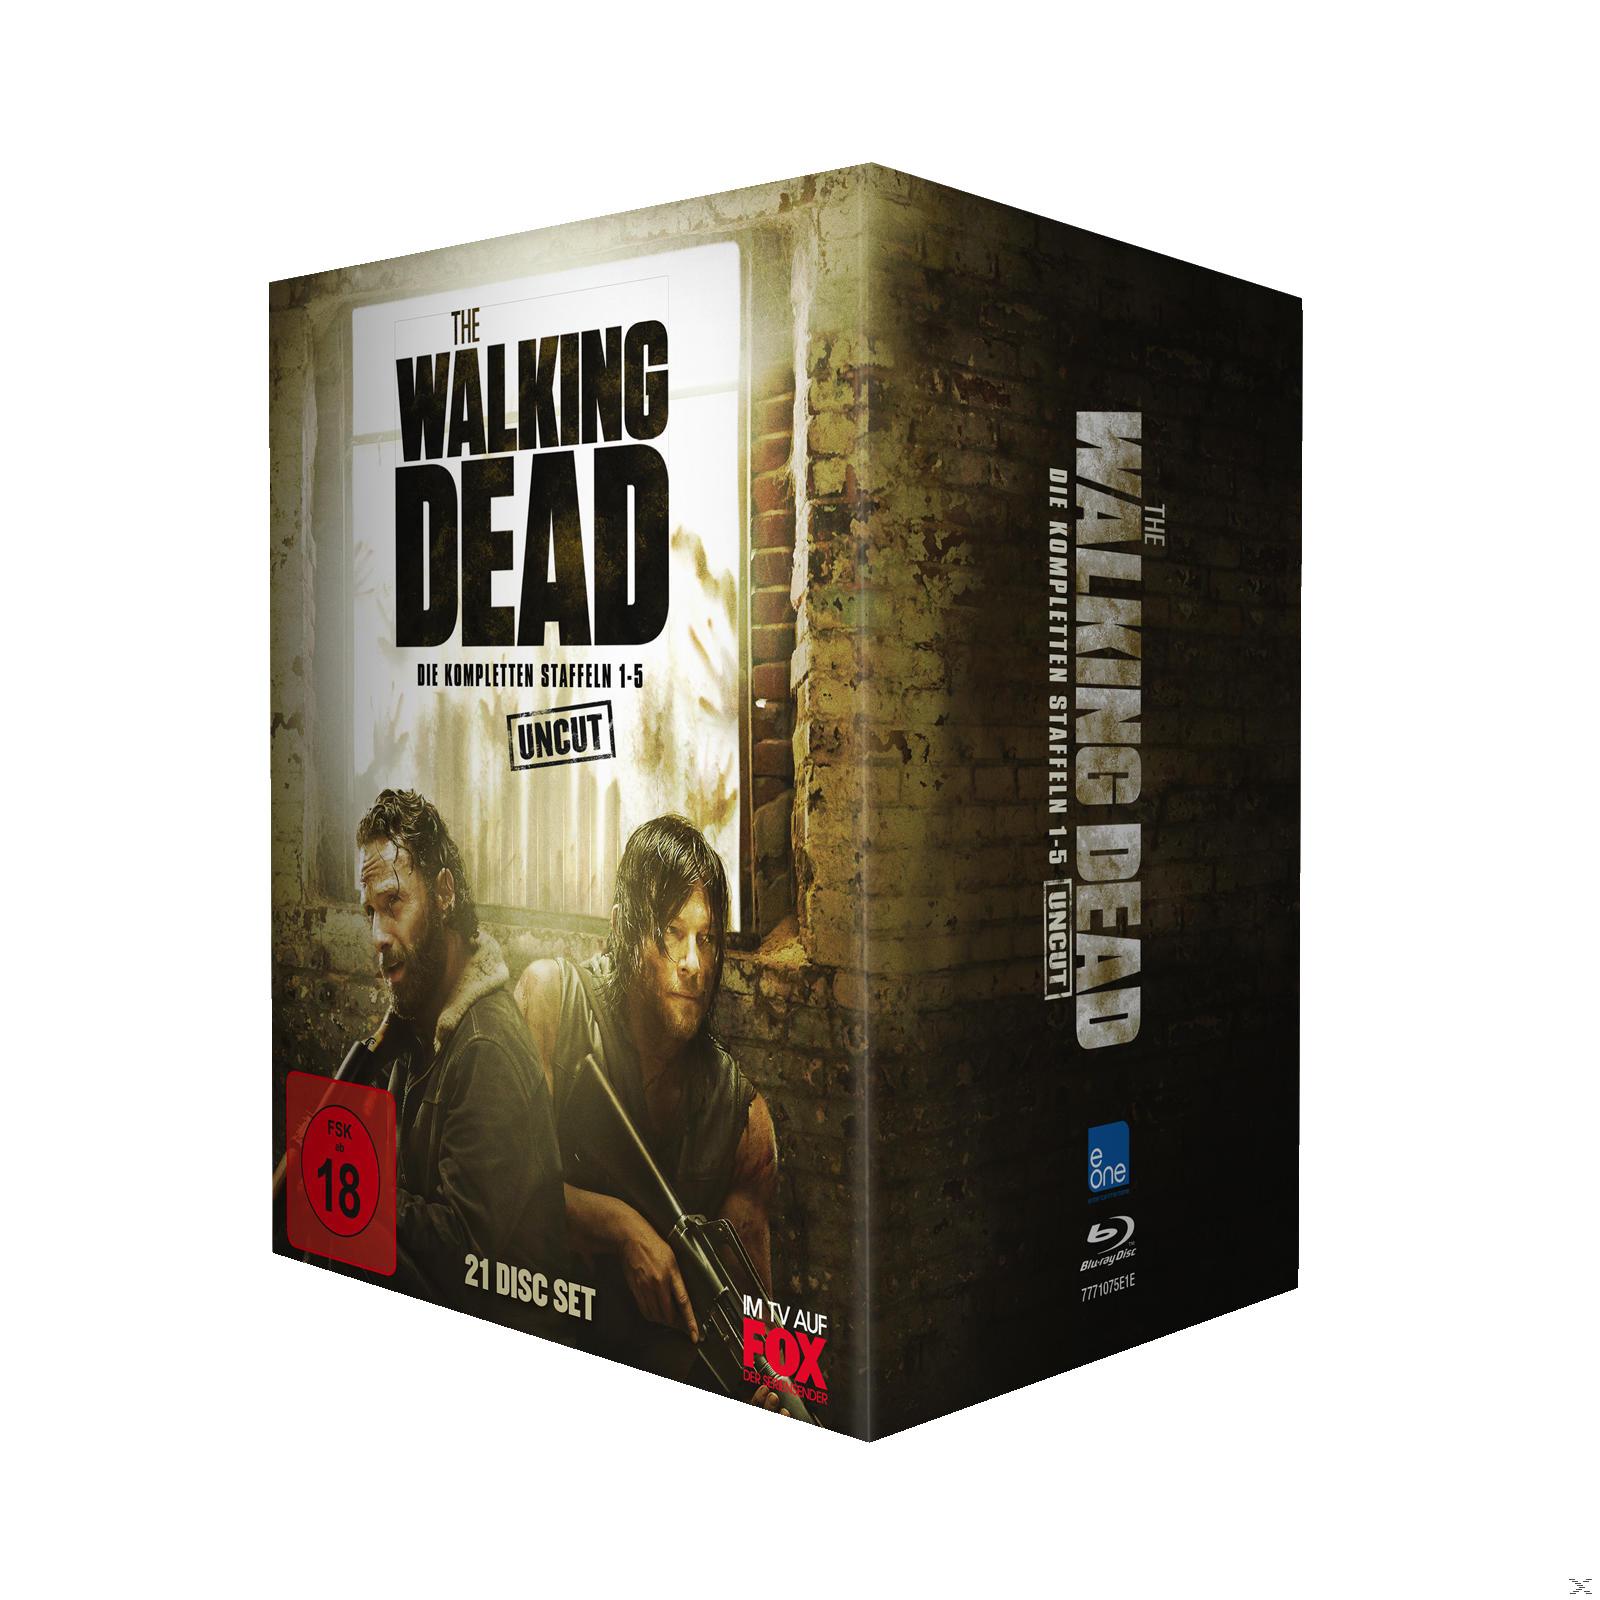 The Walking Dead 1-5 Box - UNCUT (BD) [Blu-ray] 2